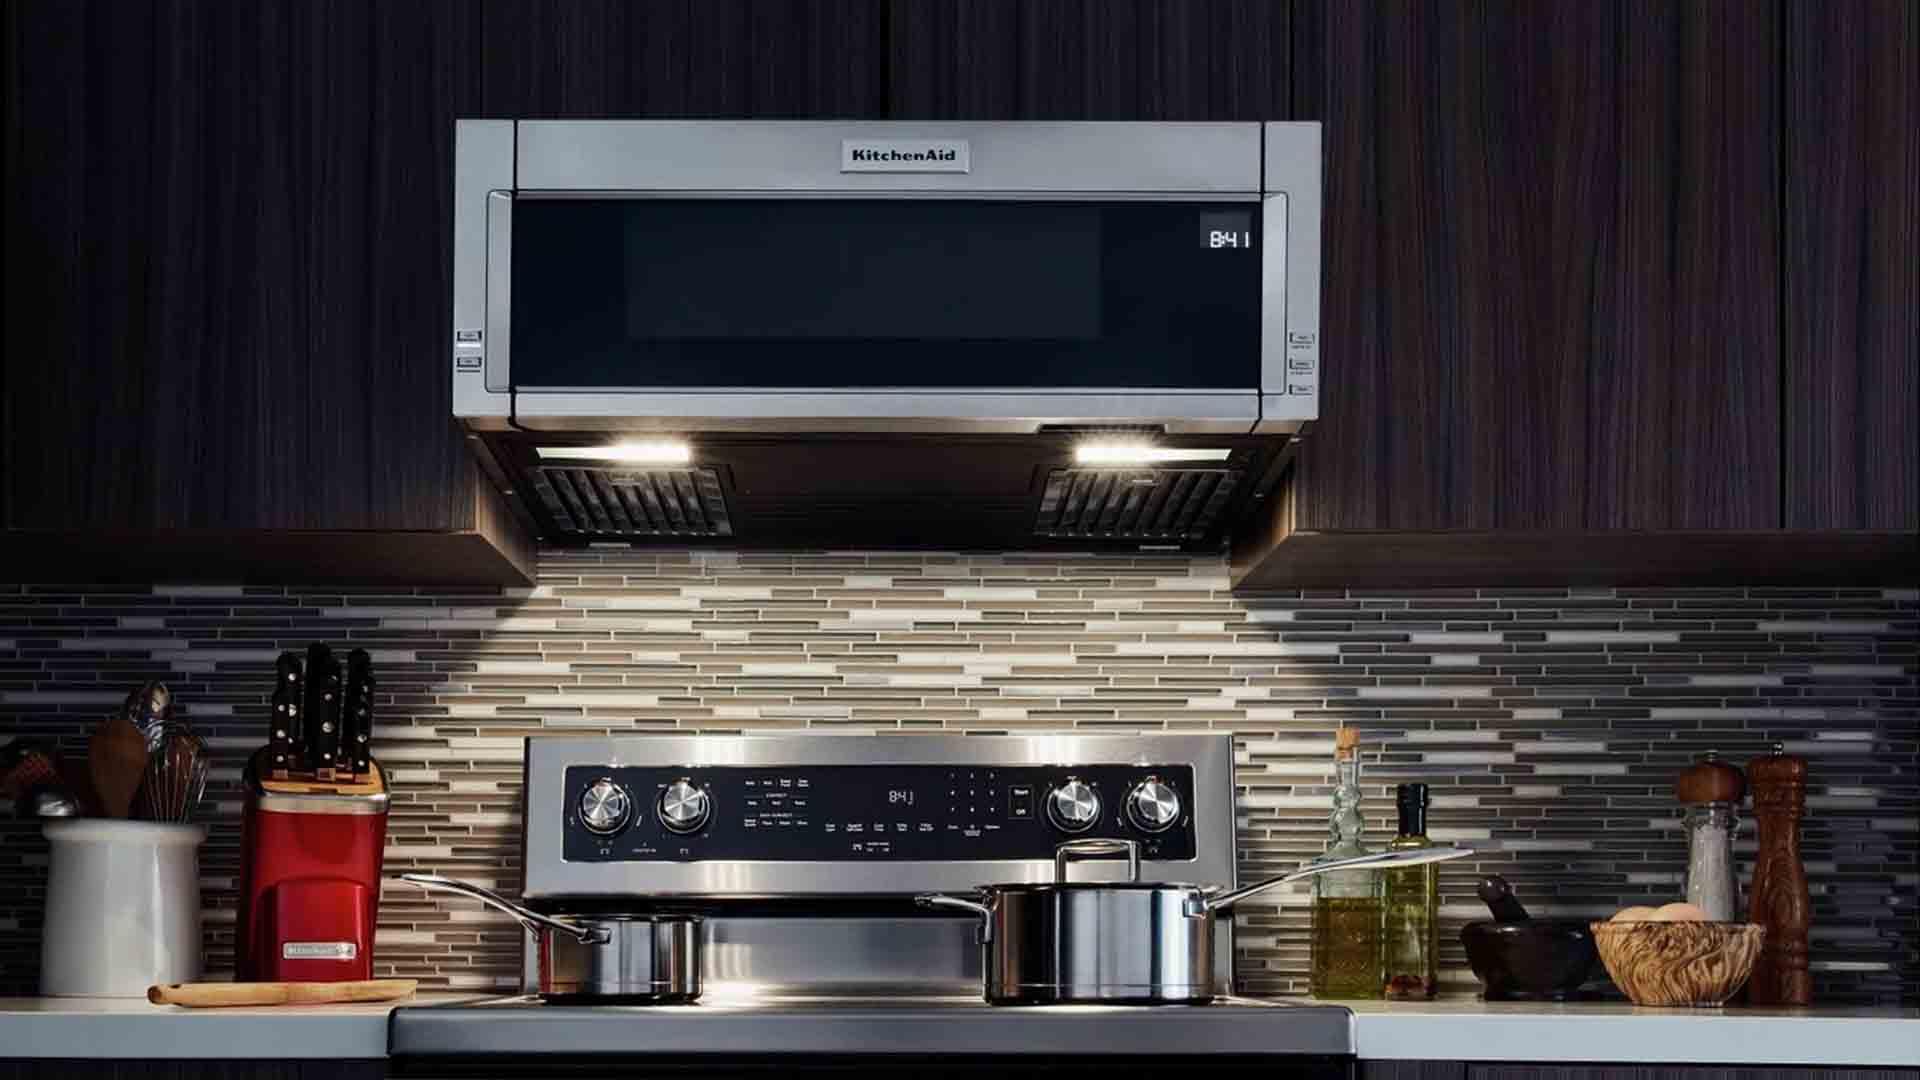 KitchenAid Microwave Hood Combination Repair Service | KitchenAid Repairs